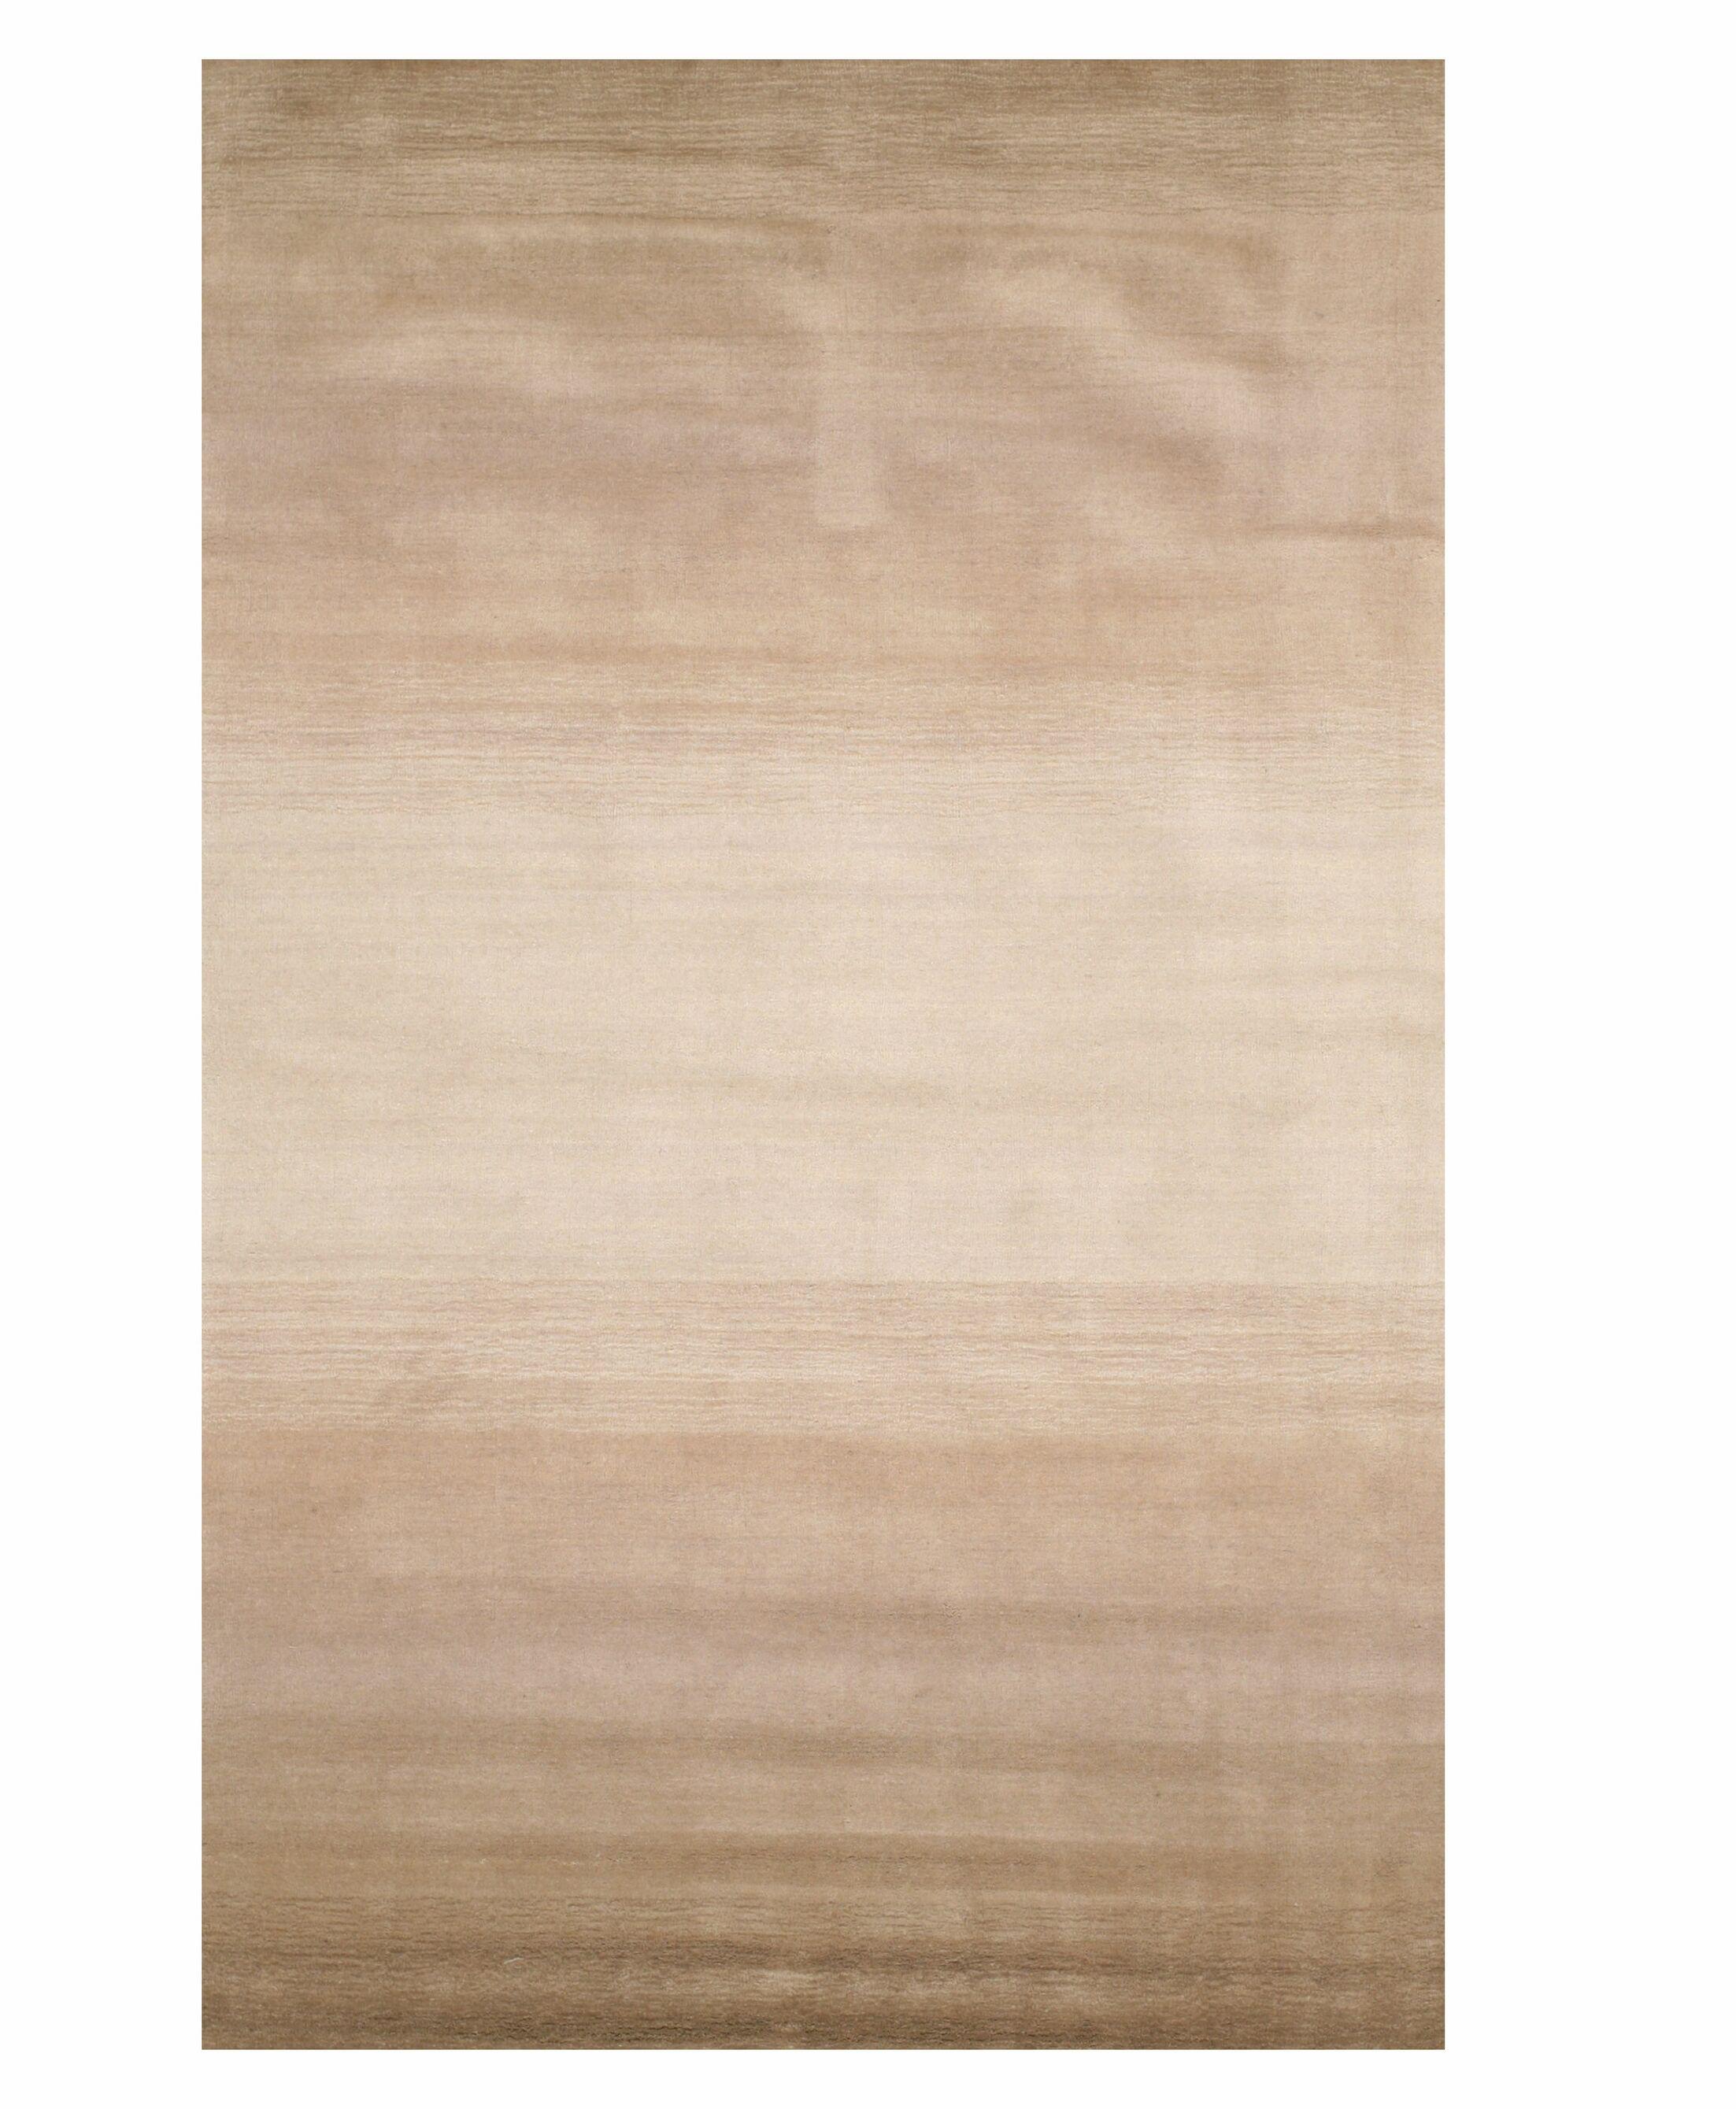 Johnny Horizon Handmade Beige Area Rug Rug Size: 8'9 x 11'9